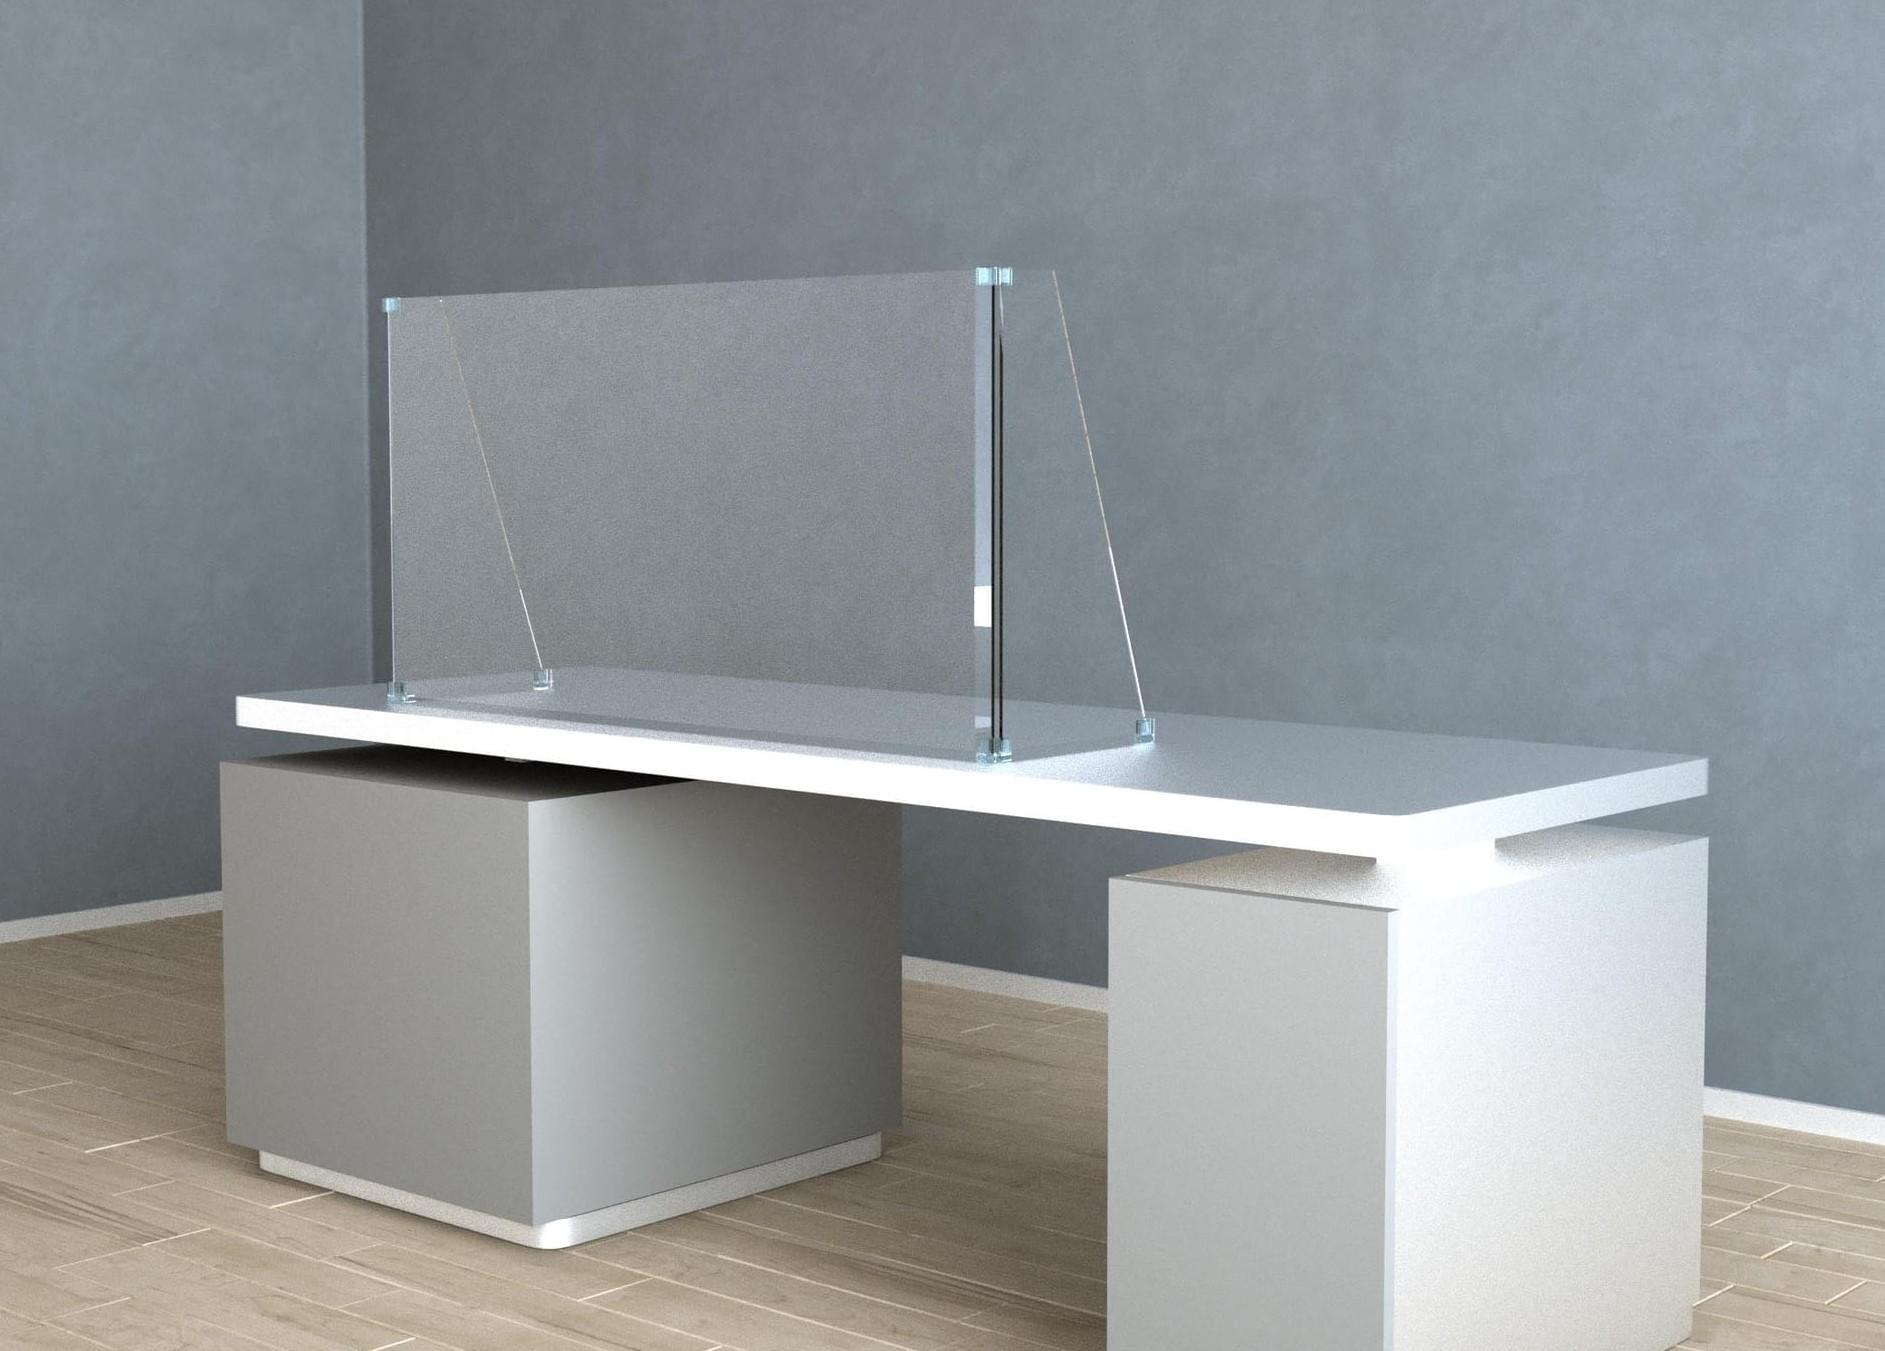 Barriere di plexiglass per negozi e uffici. Prezzi medi e ...